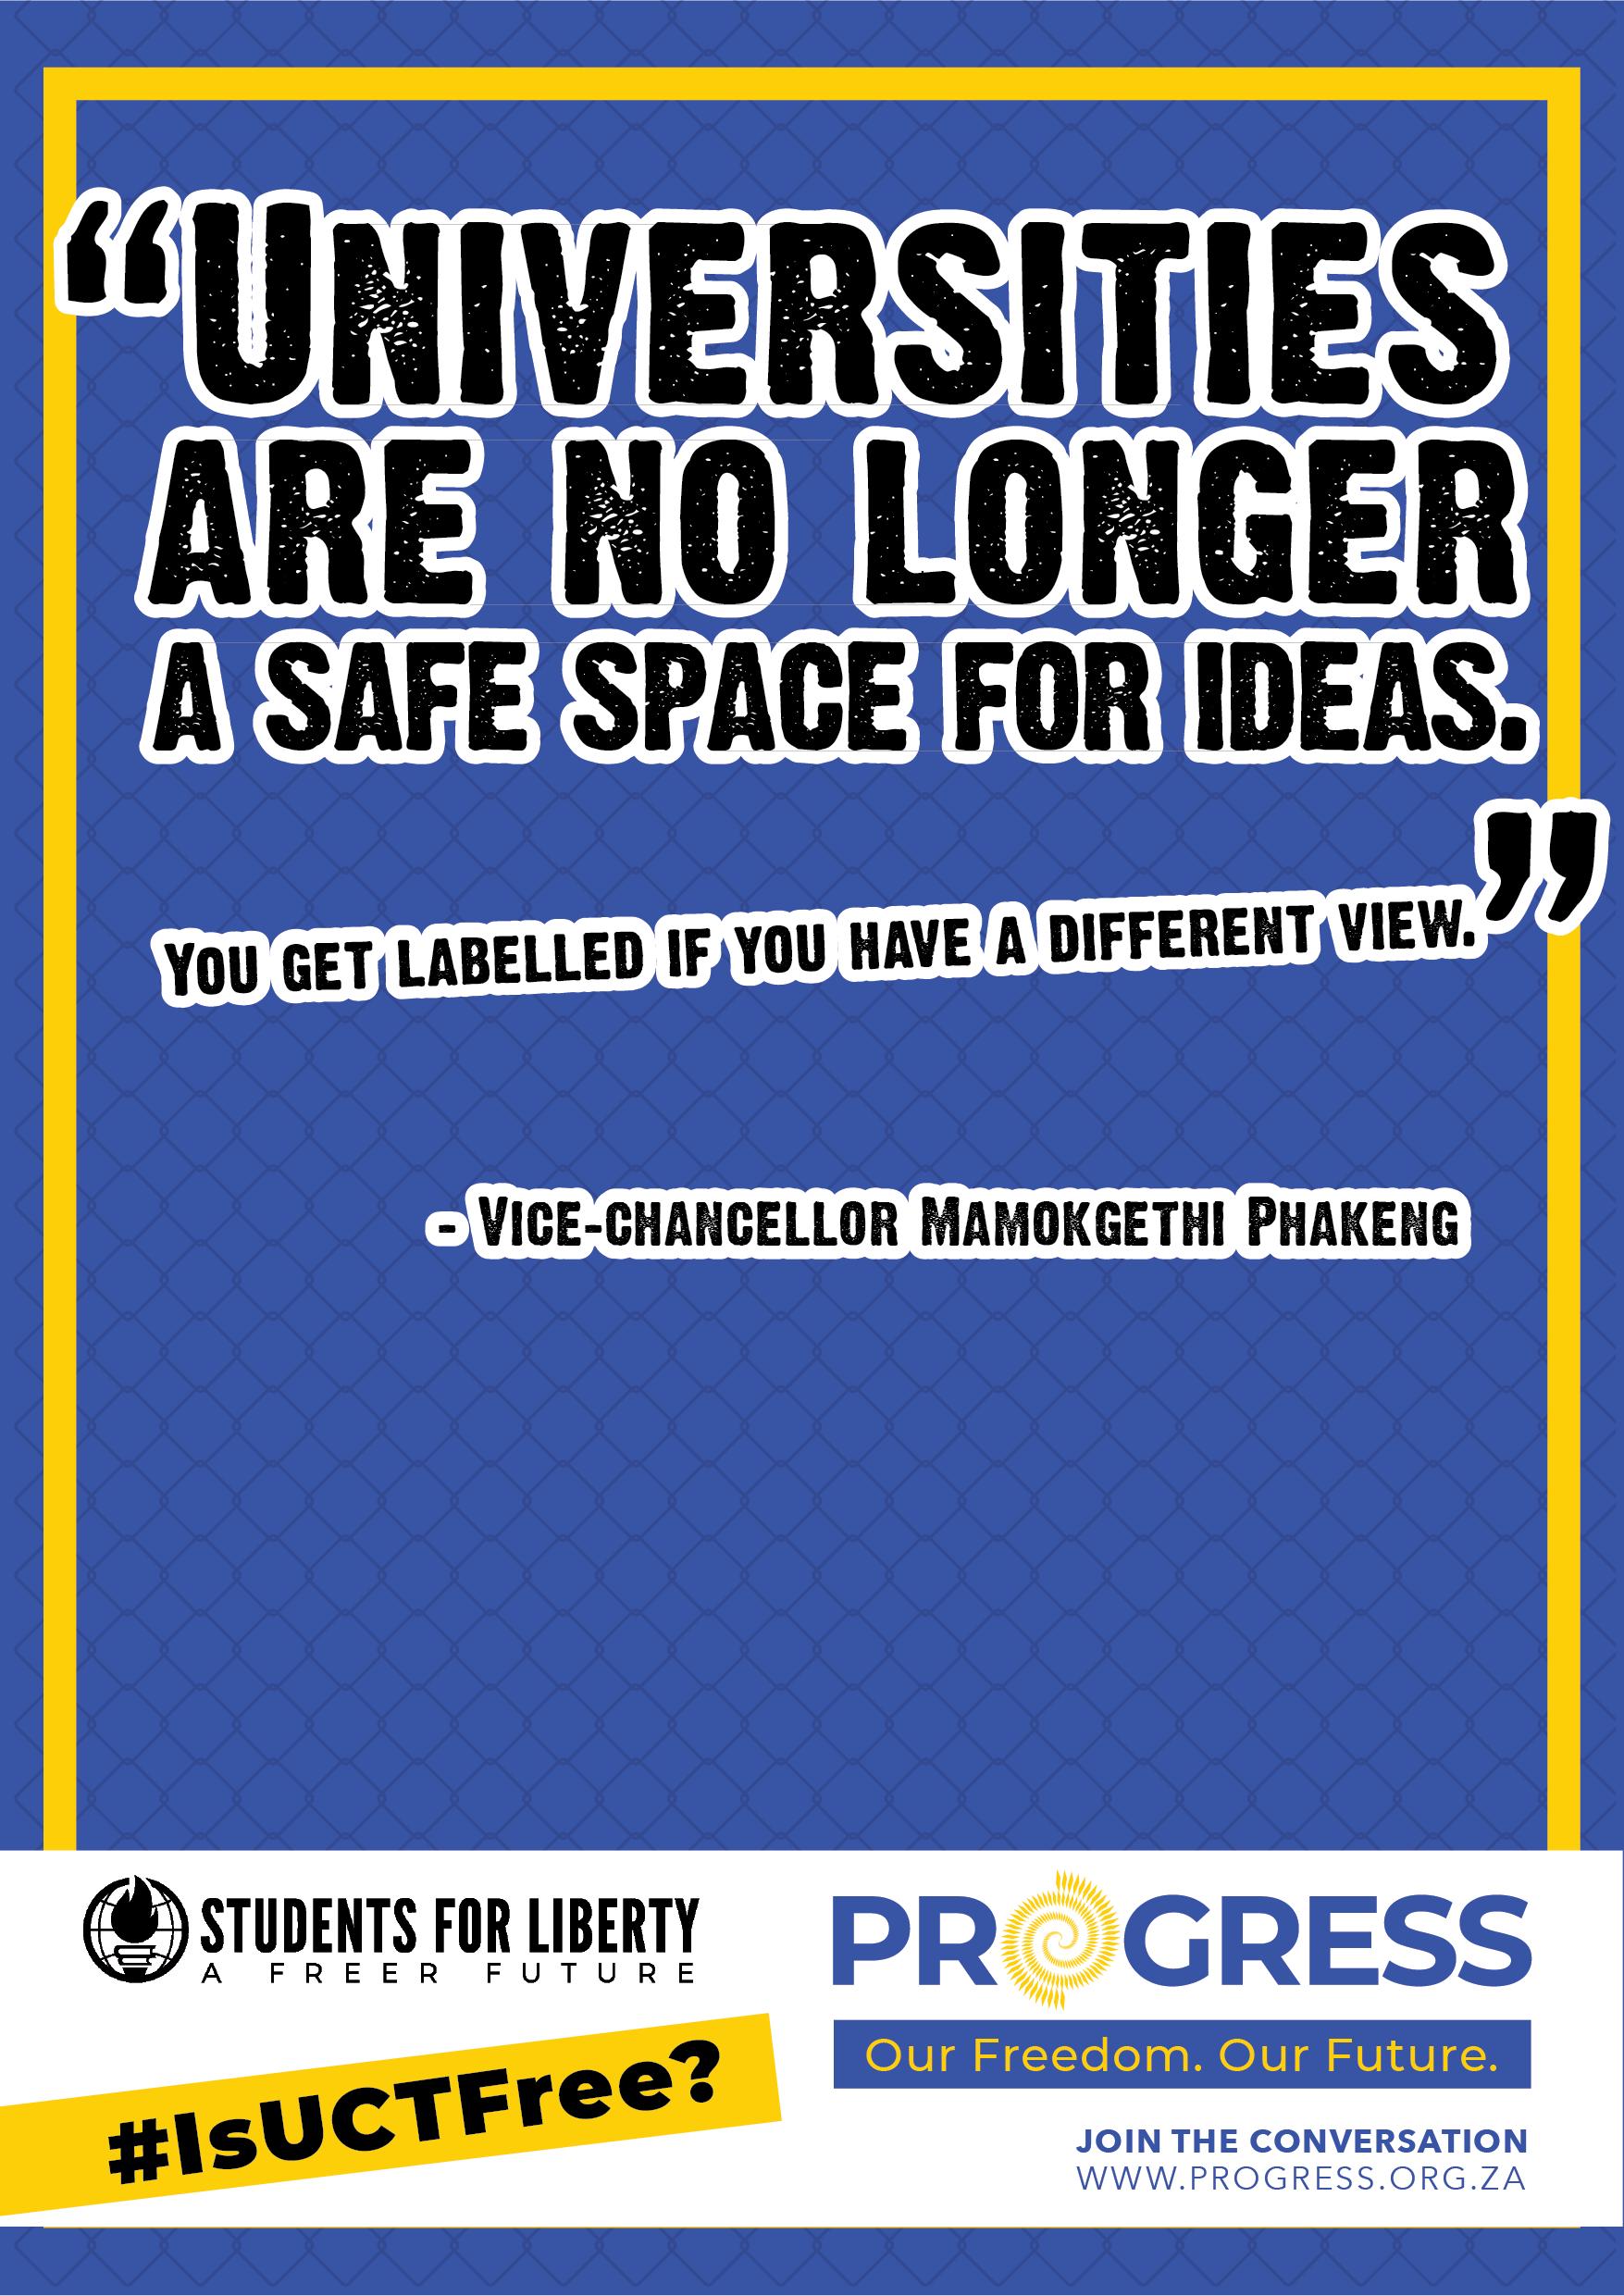 Progress_A3_Posters_proof 3-05.png